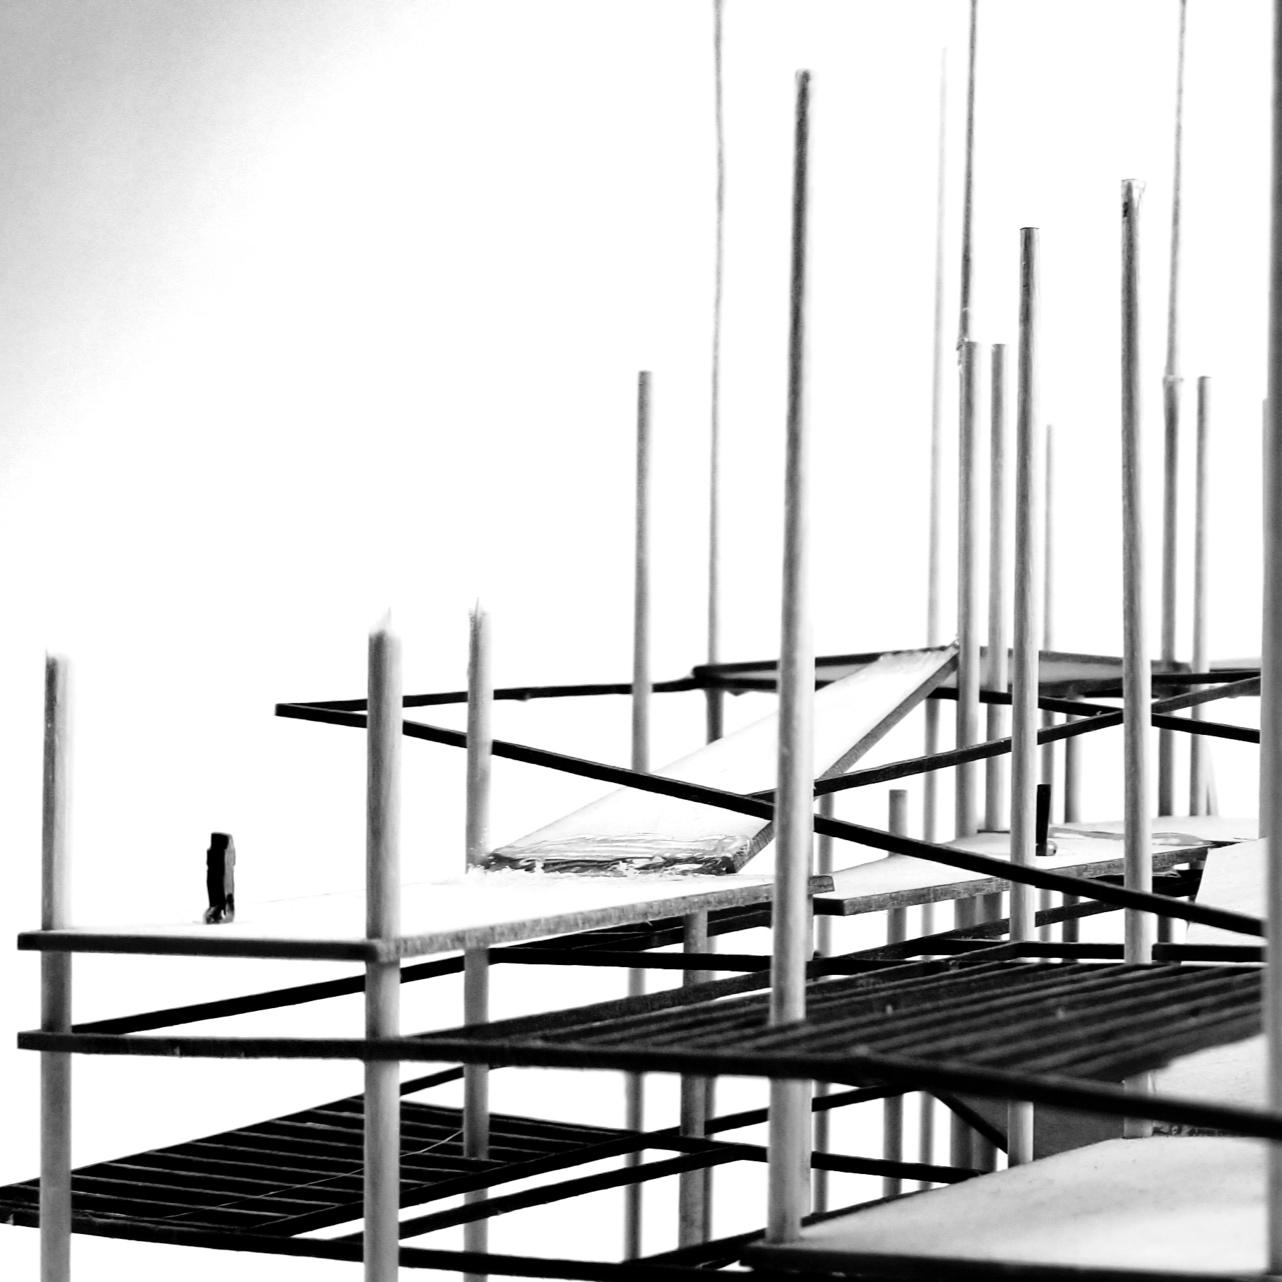 Robert Feagans, Jr., Student, Georgia Tech School of Architecture